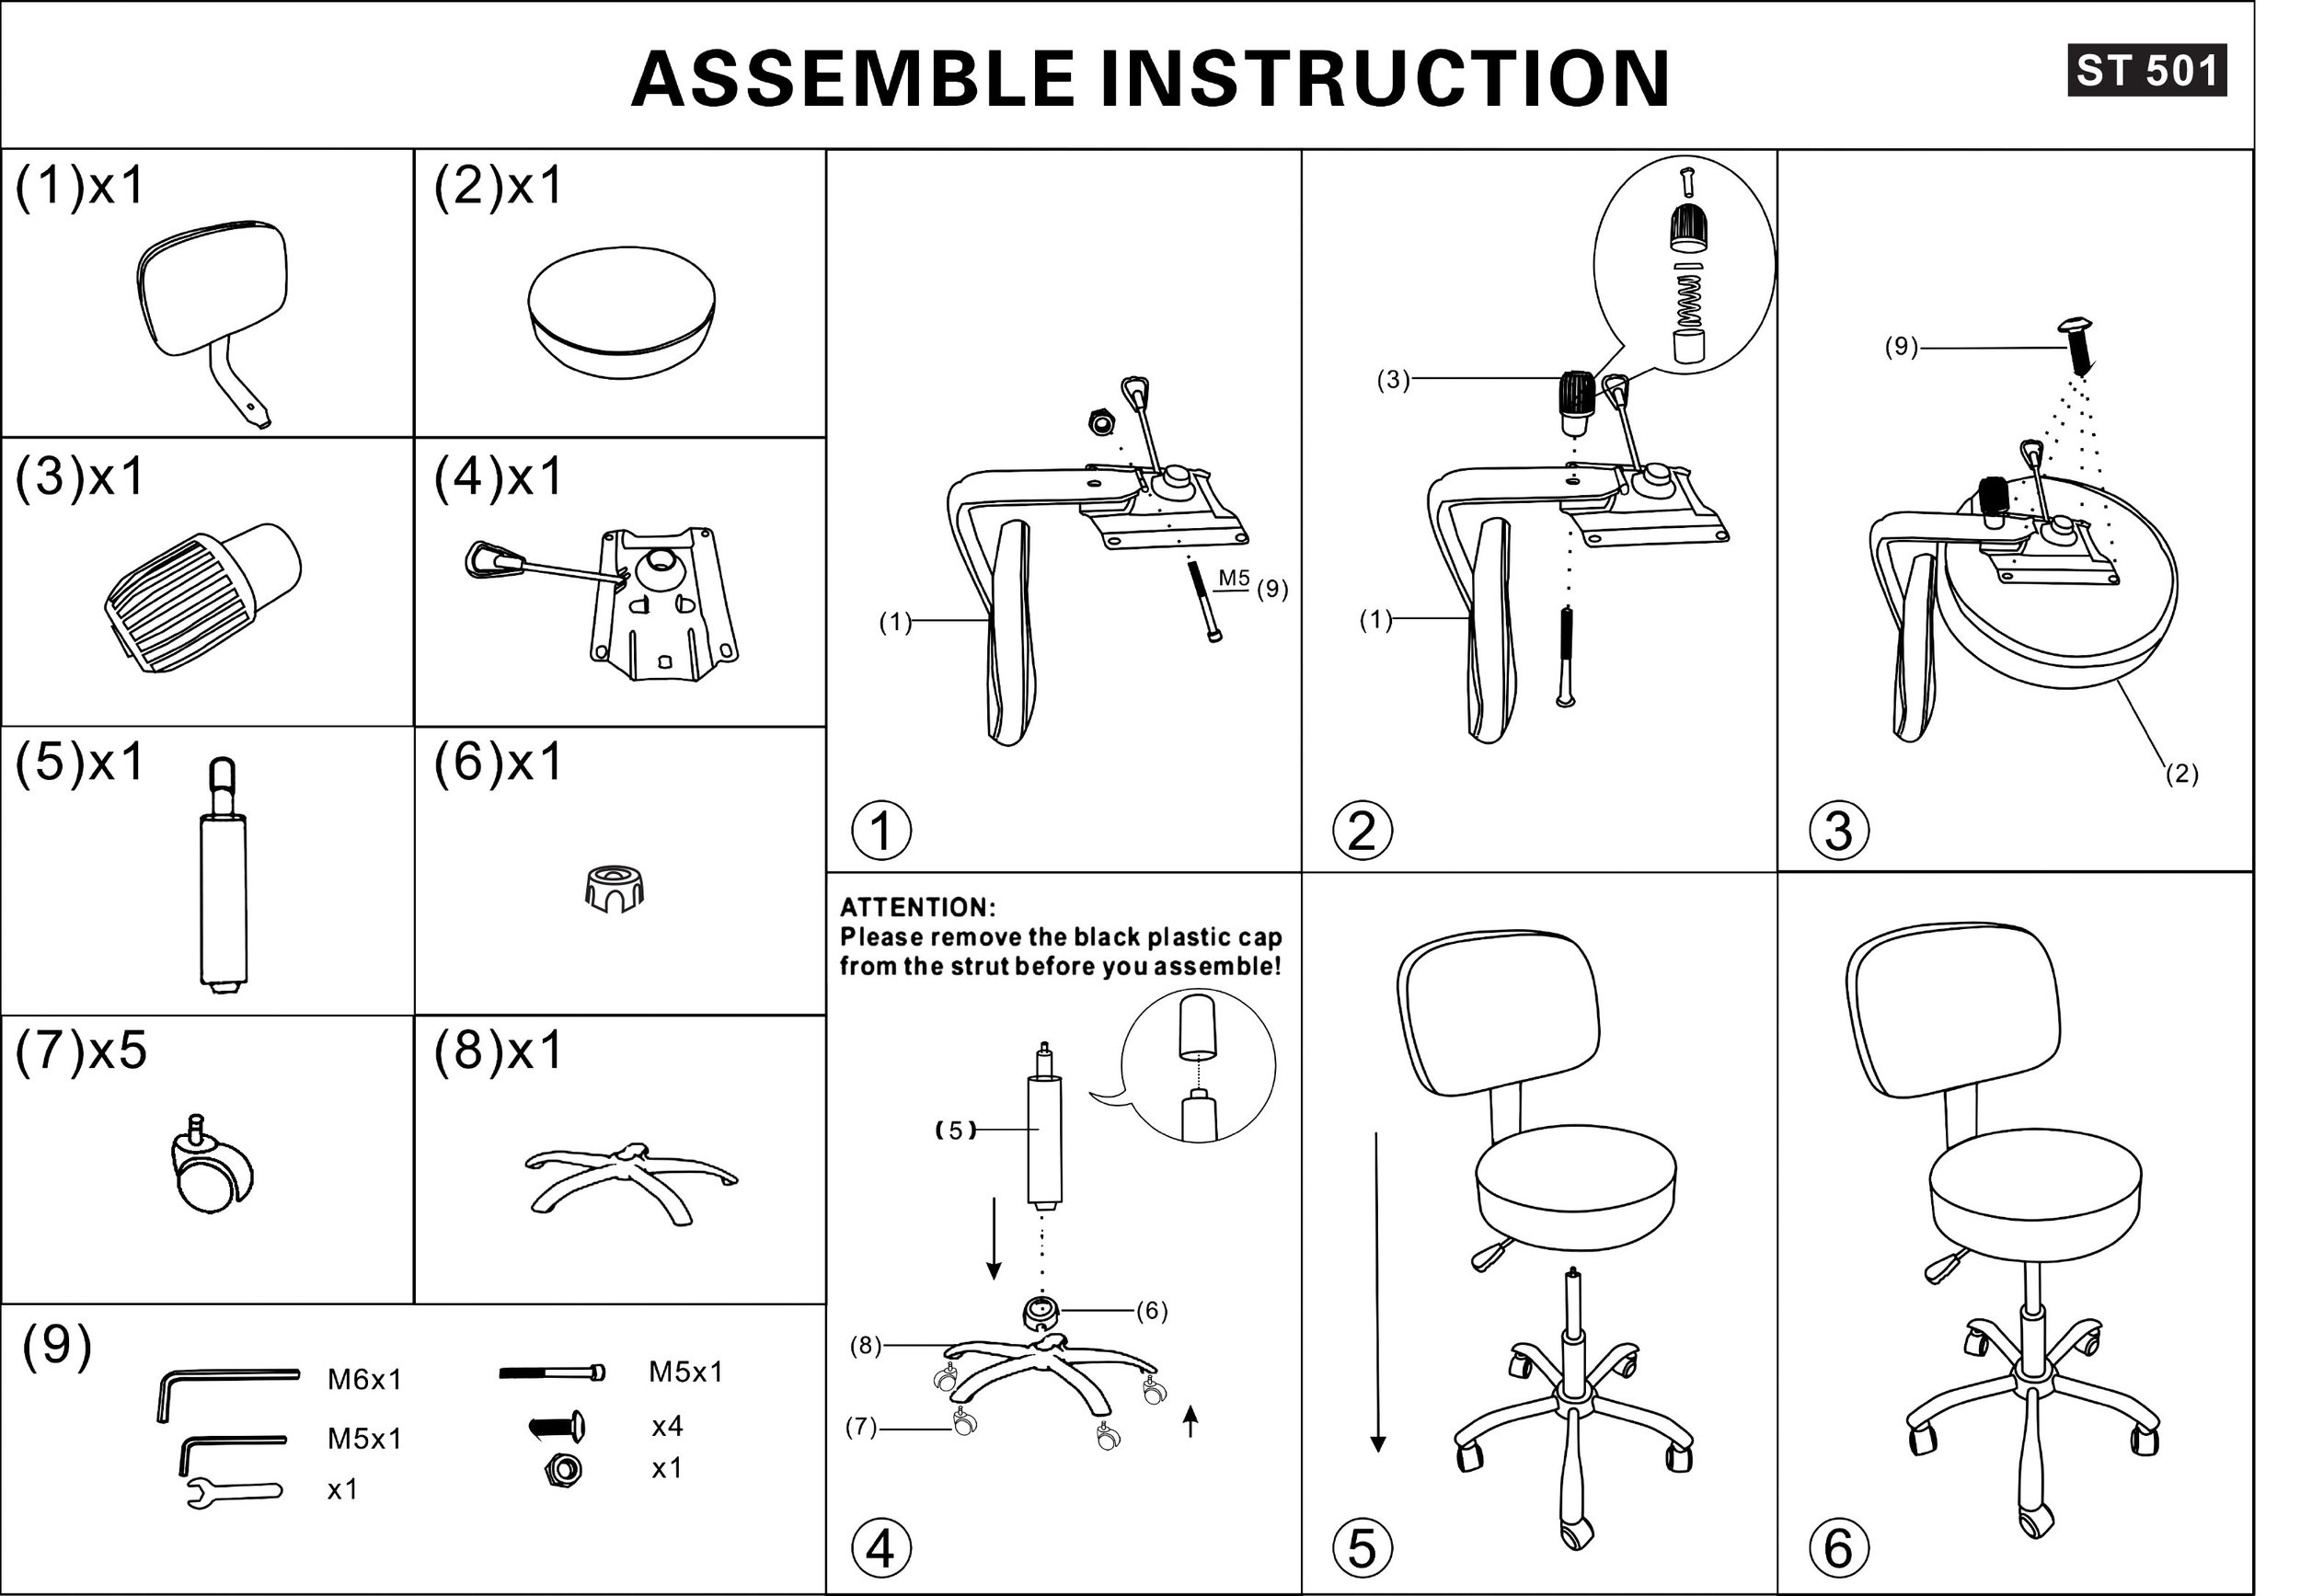 Assembly Instruction - Stool 501